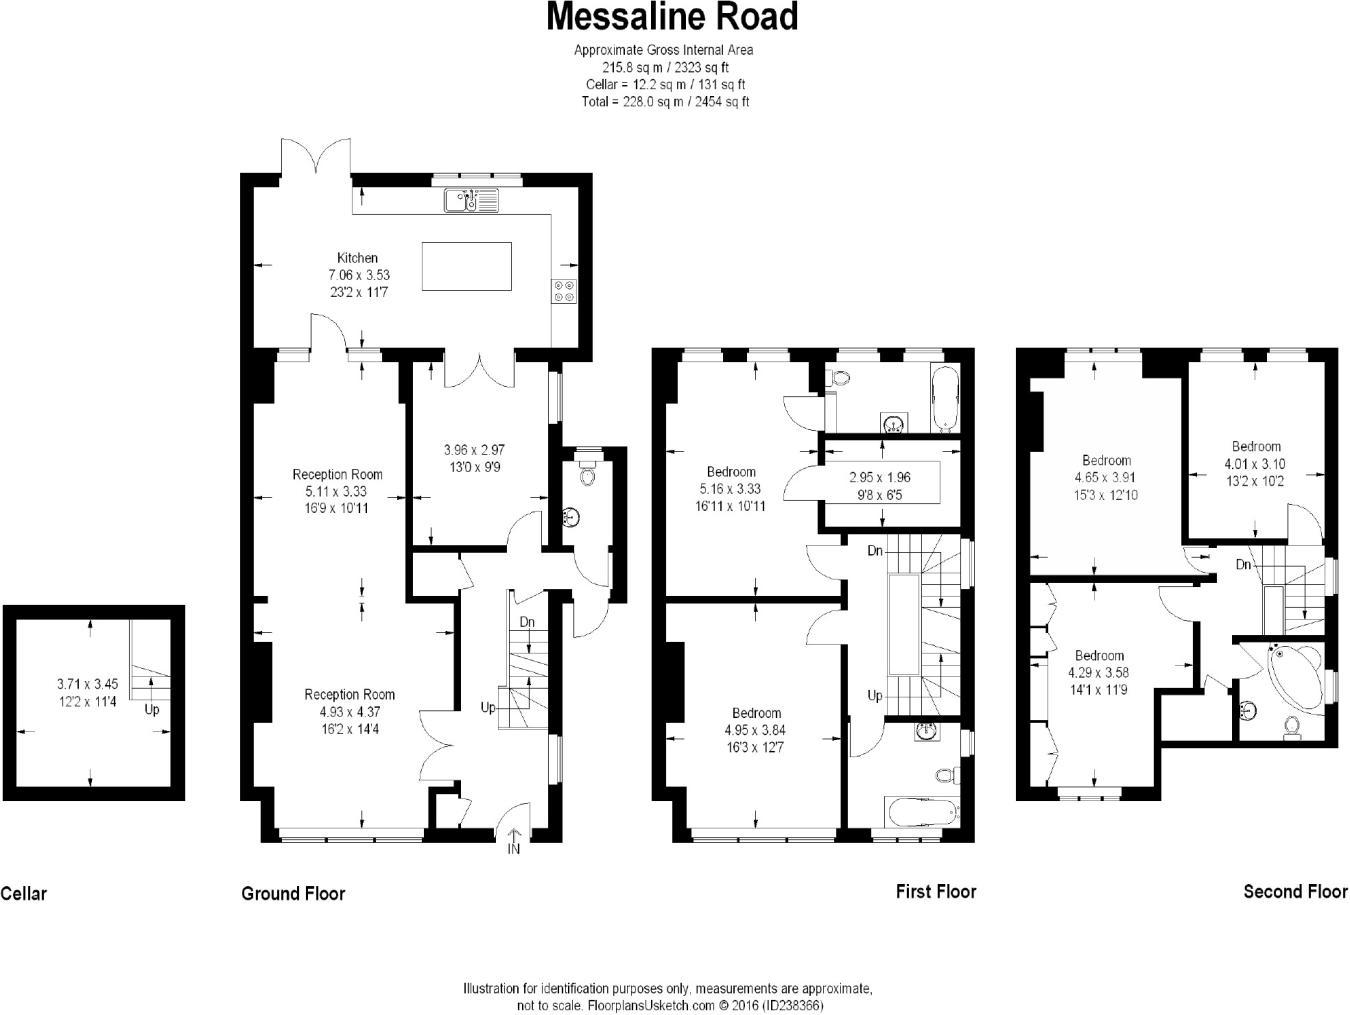 Floorplan - 6 Bedroom House for Sale